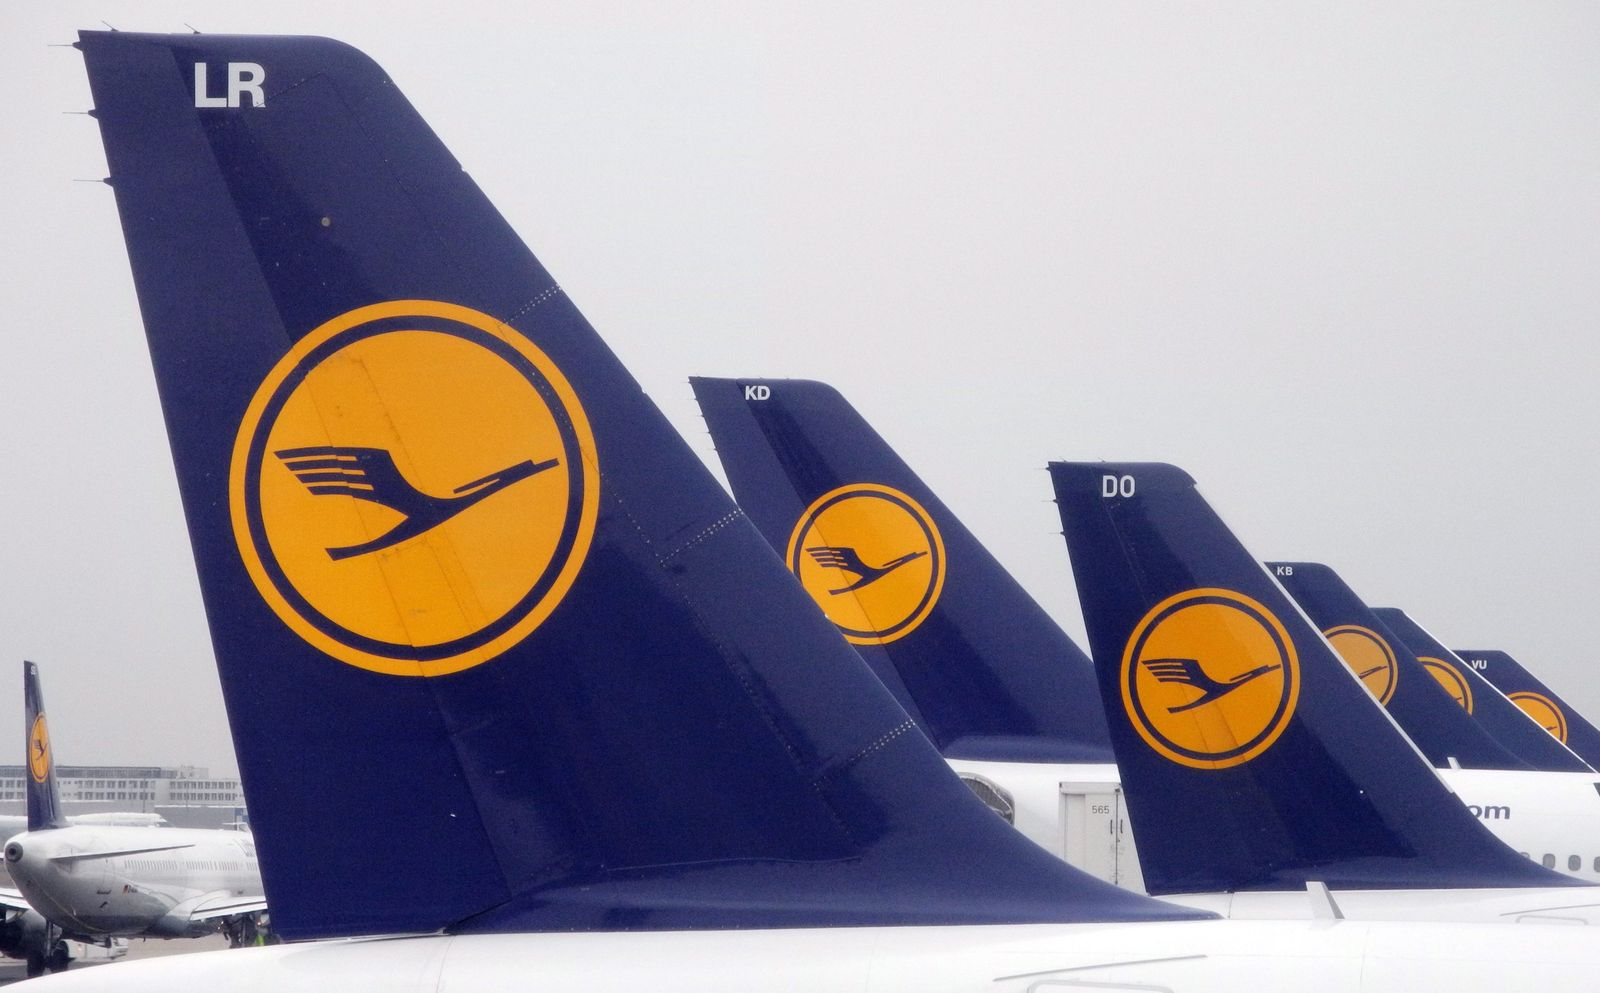 German Lufthansa strike